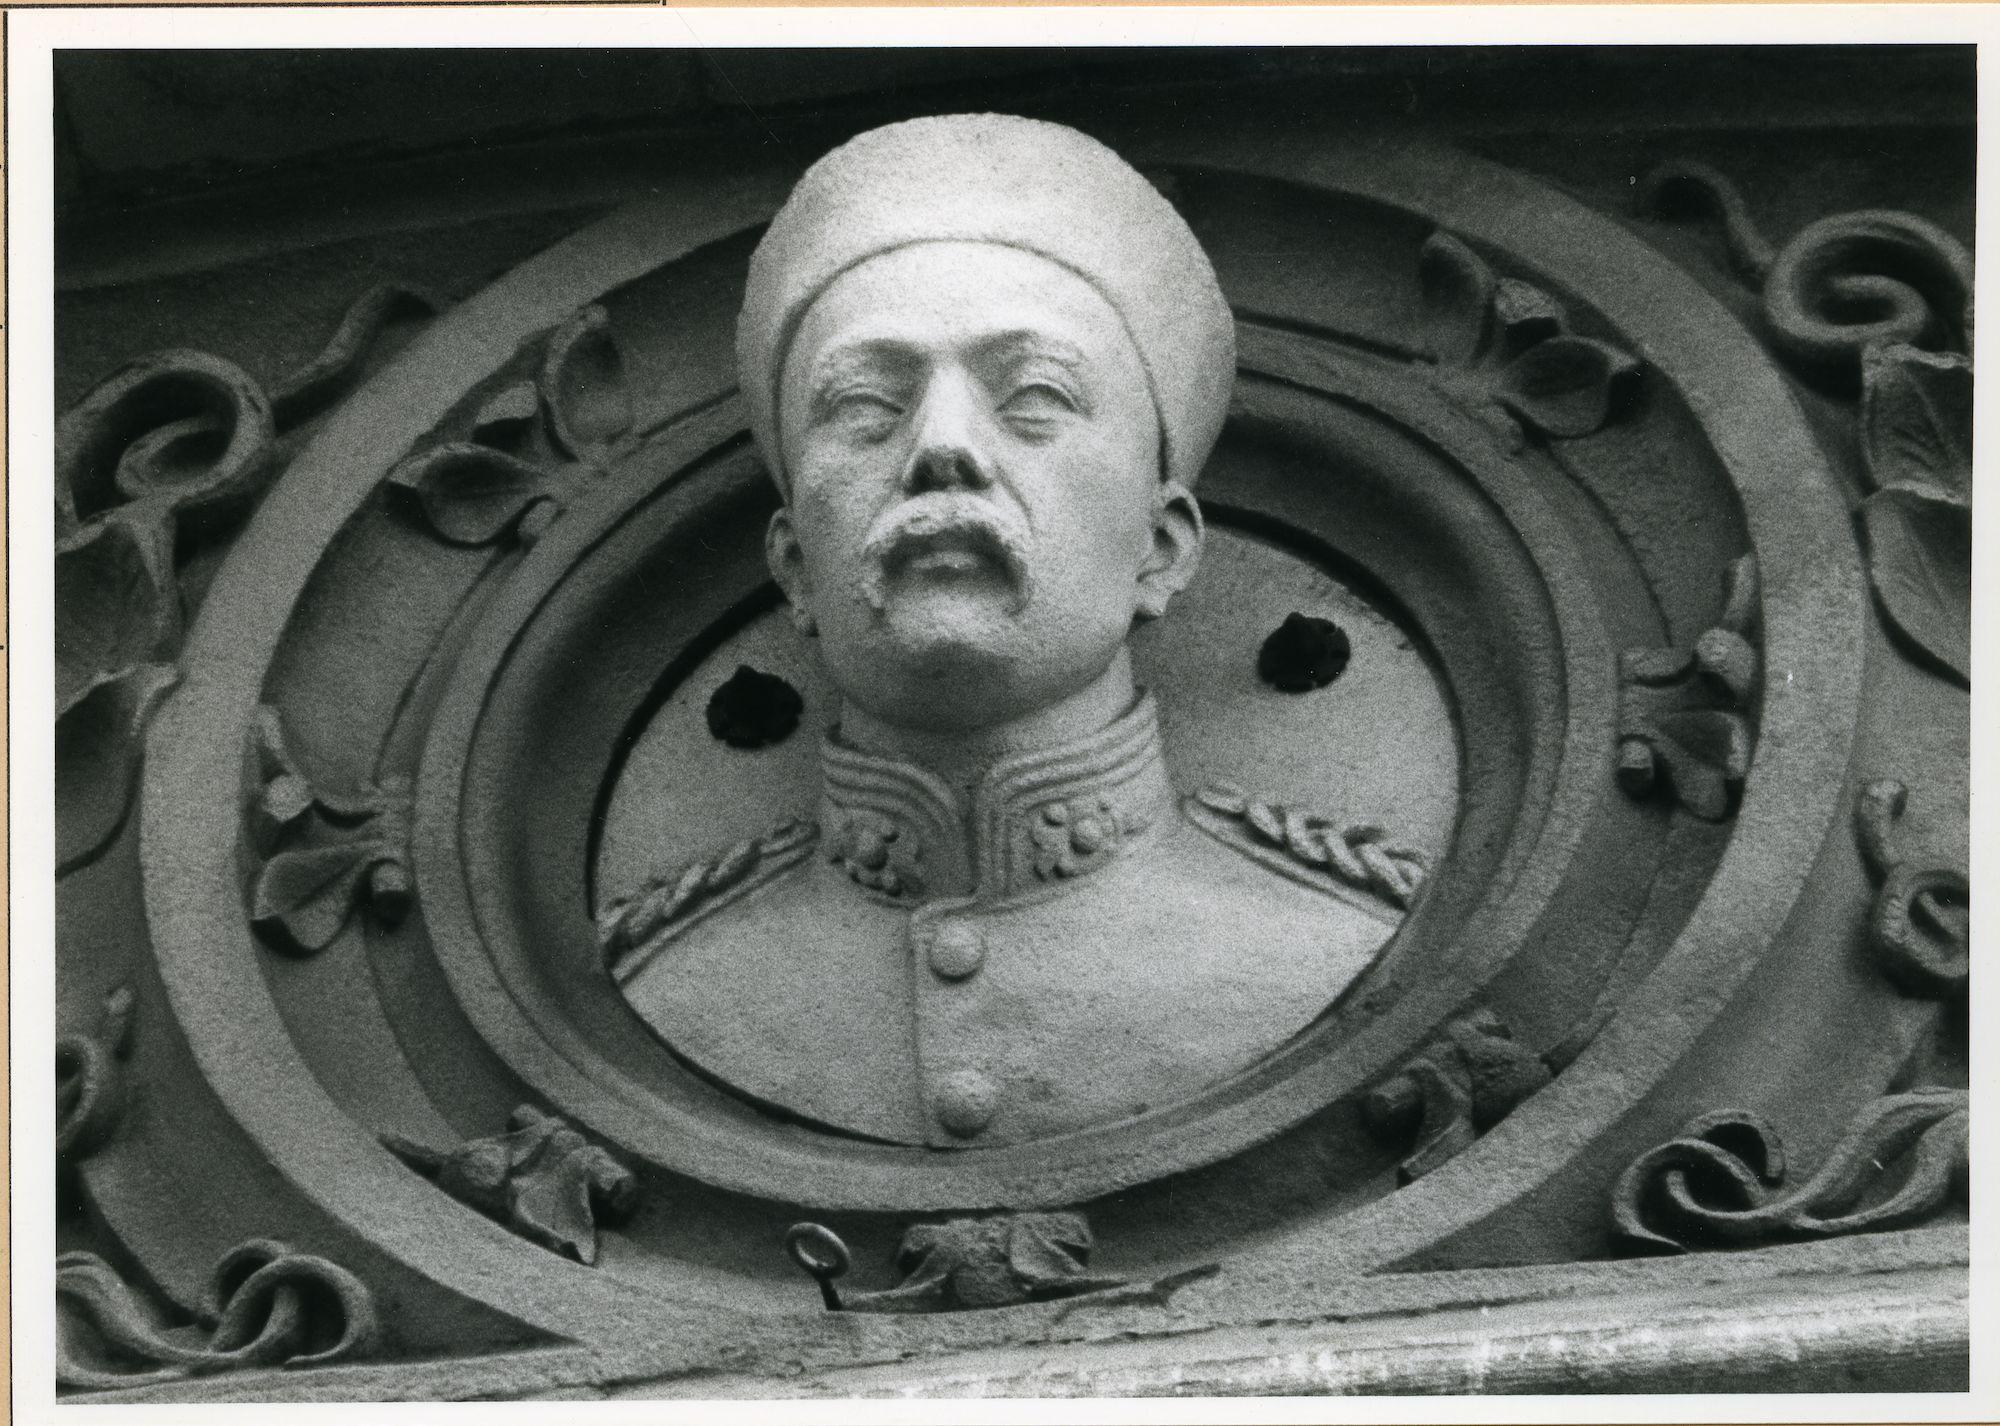 Gent: Pakhuisstraat: Buste, 1981